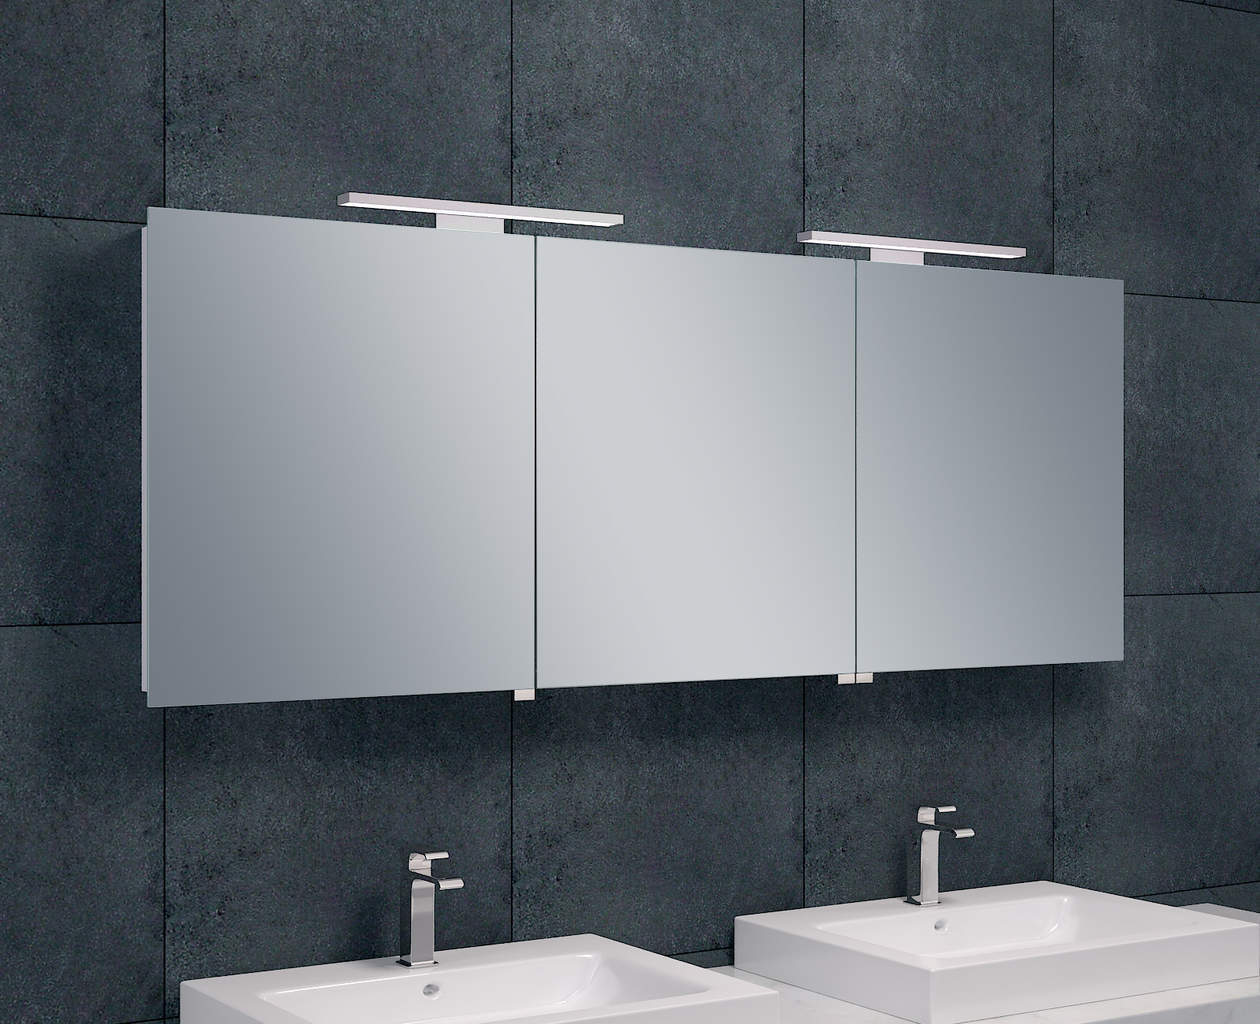 luxe spiegelkast led verlichting 160x60x14cm megadump. Black Bedroom Furniture Sets. Home Design Ideas